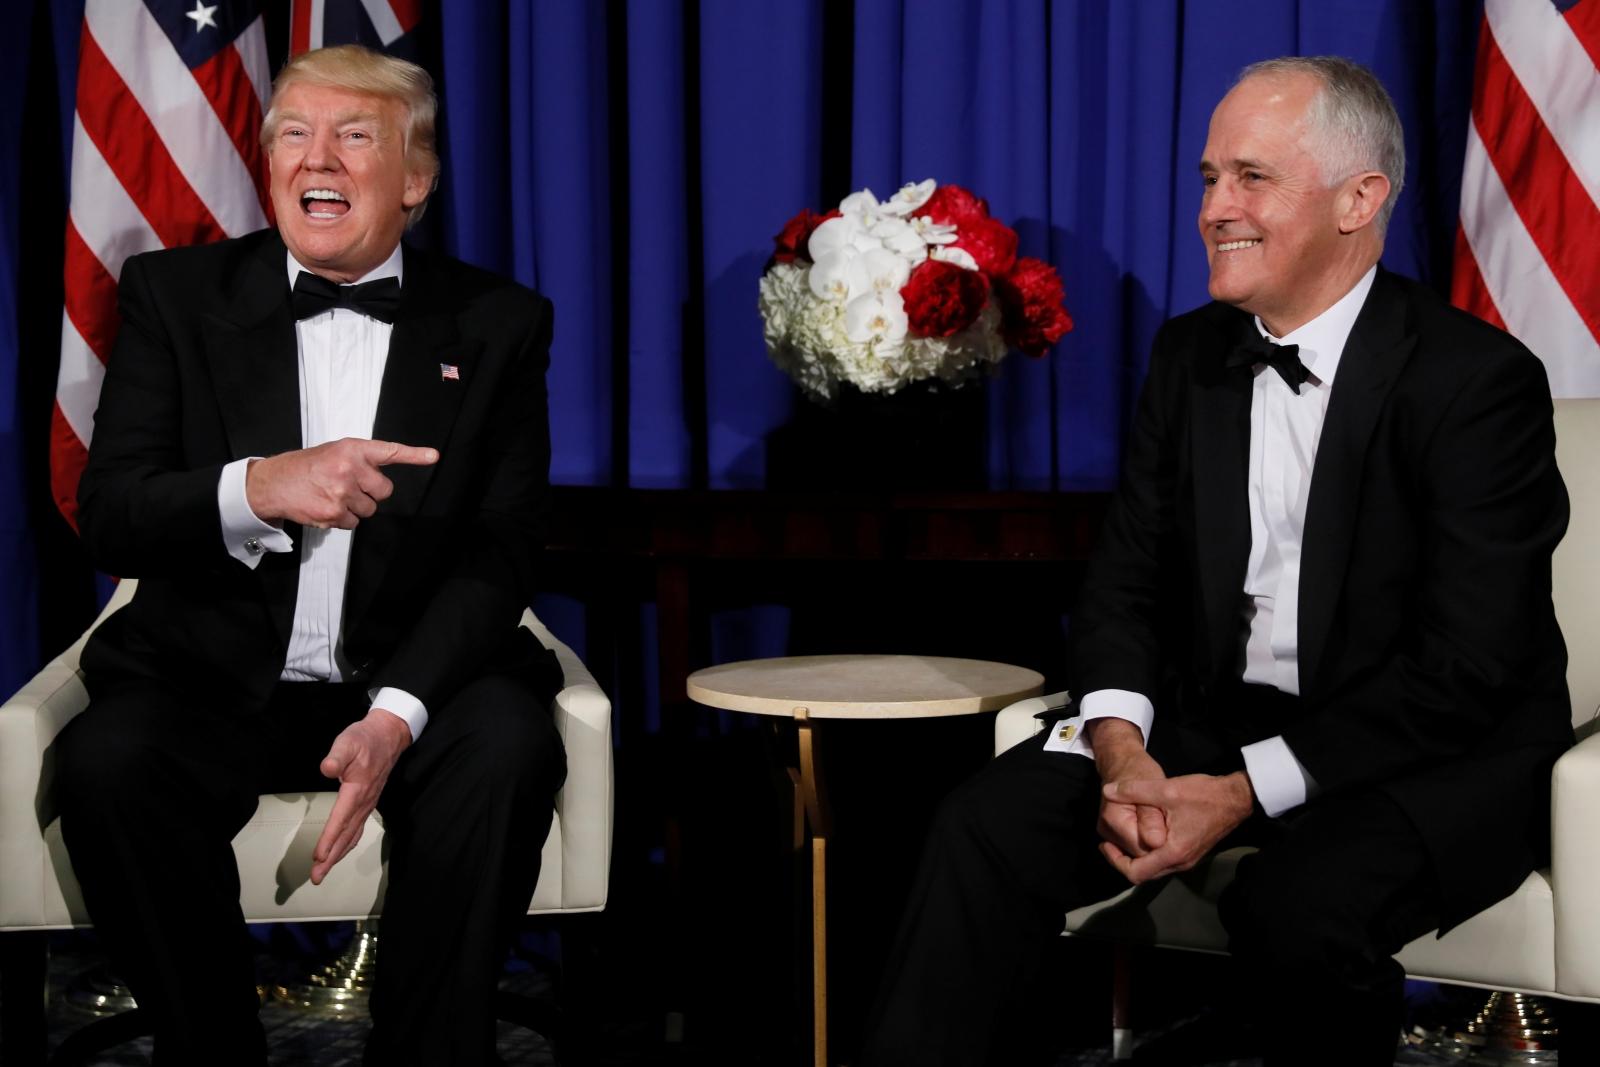 Trump and Turnbull